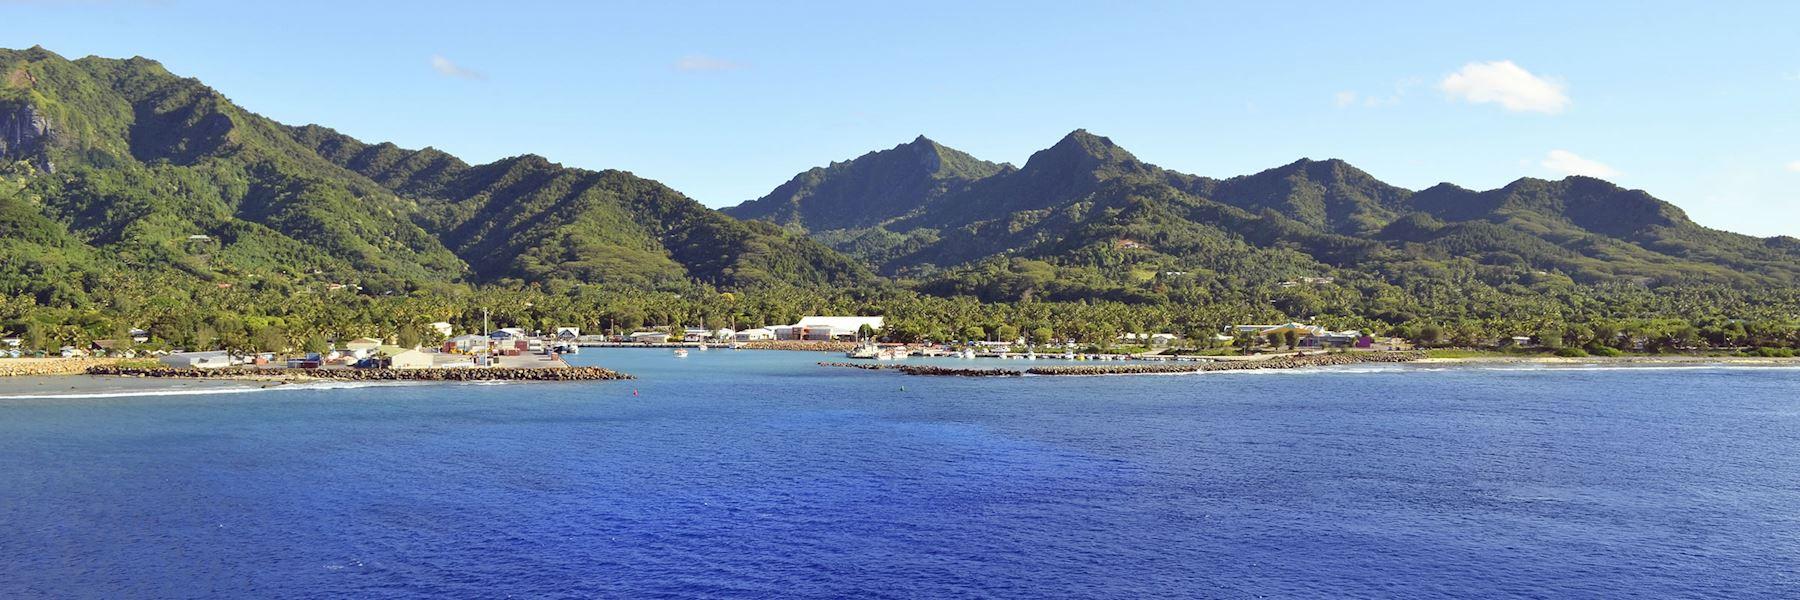 Visit Rarotonga, Cook Islands